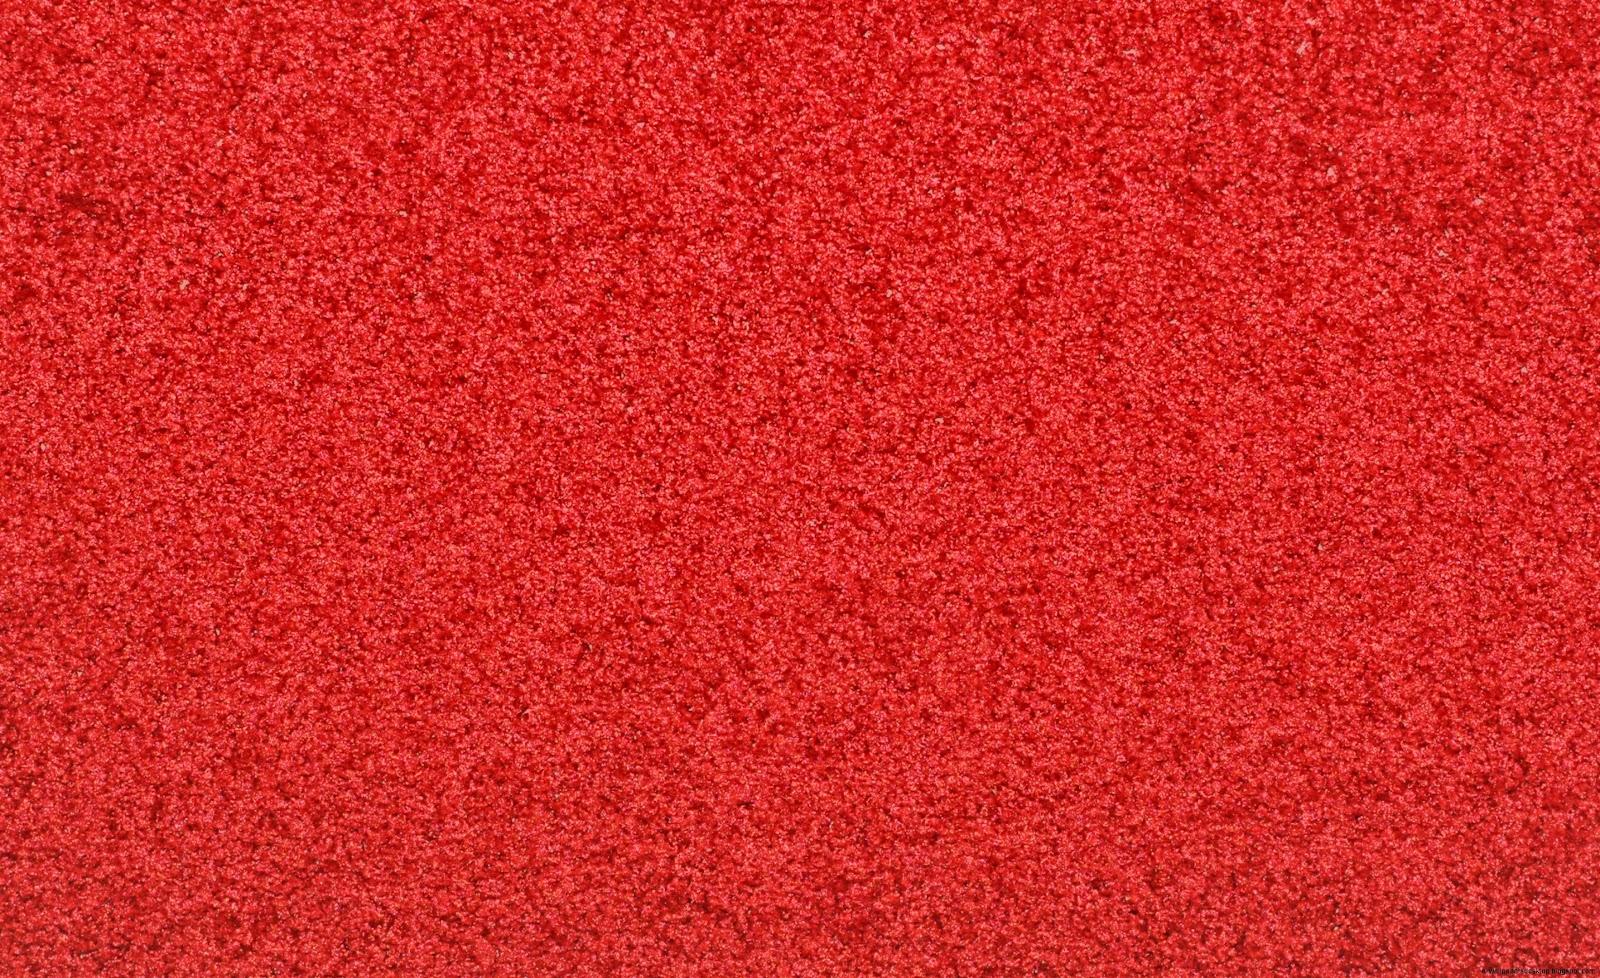 Cat Rug Red Hd Wallpaper All Wallpapers Desktop